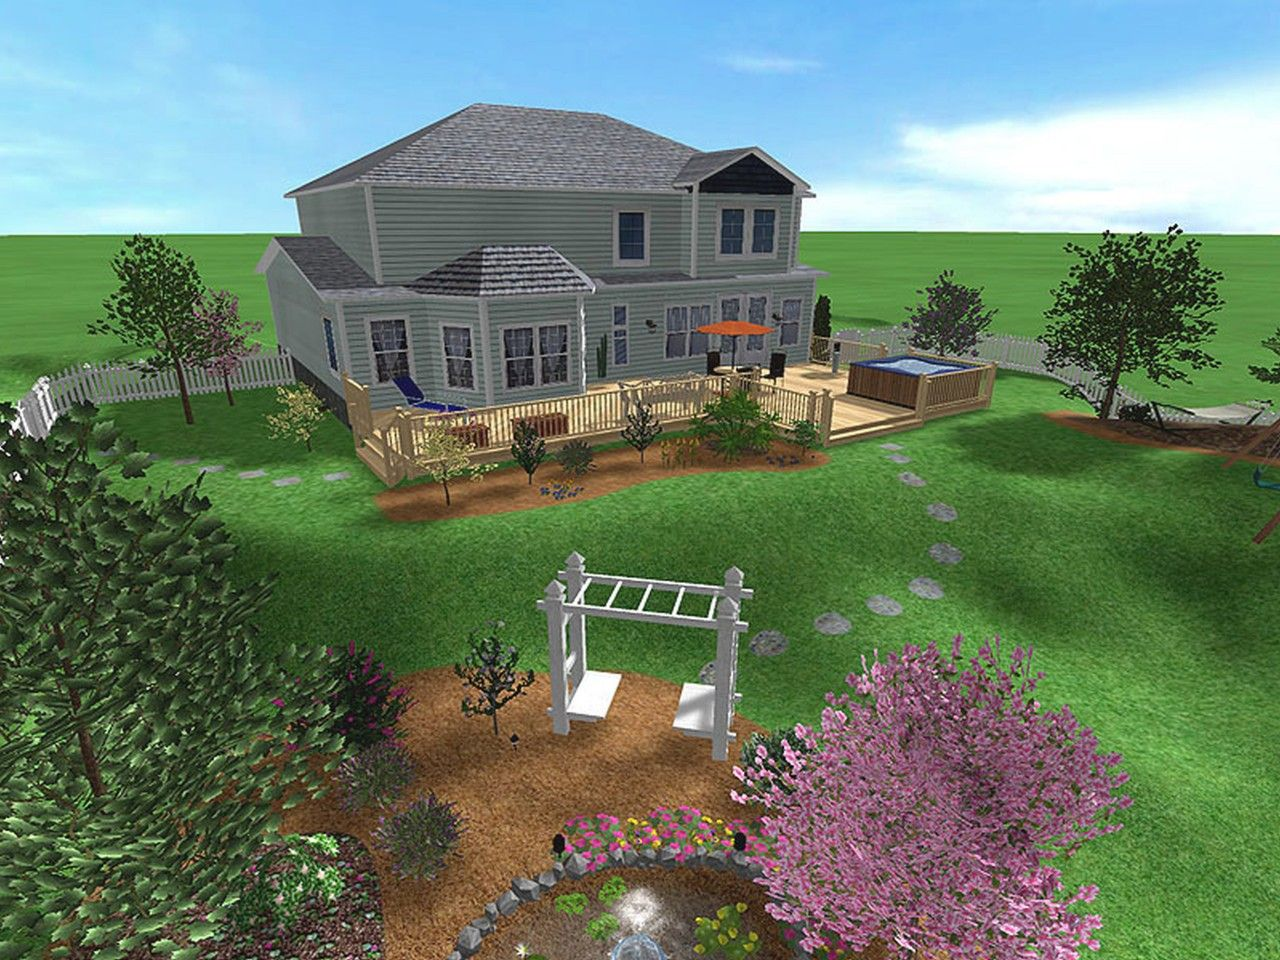 Large Yard Landscaping Ideas Front Yards Composition Glamorous